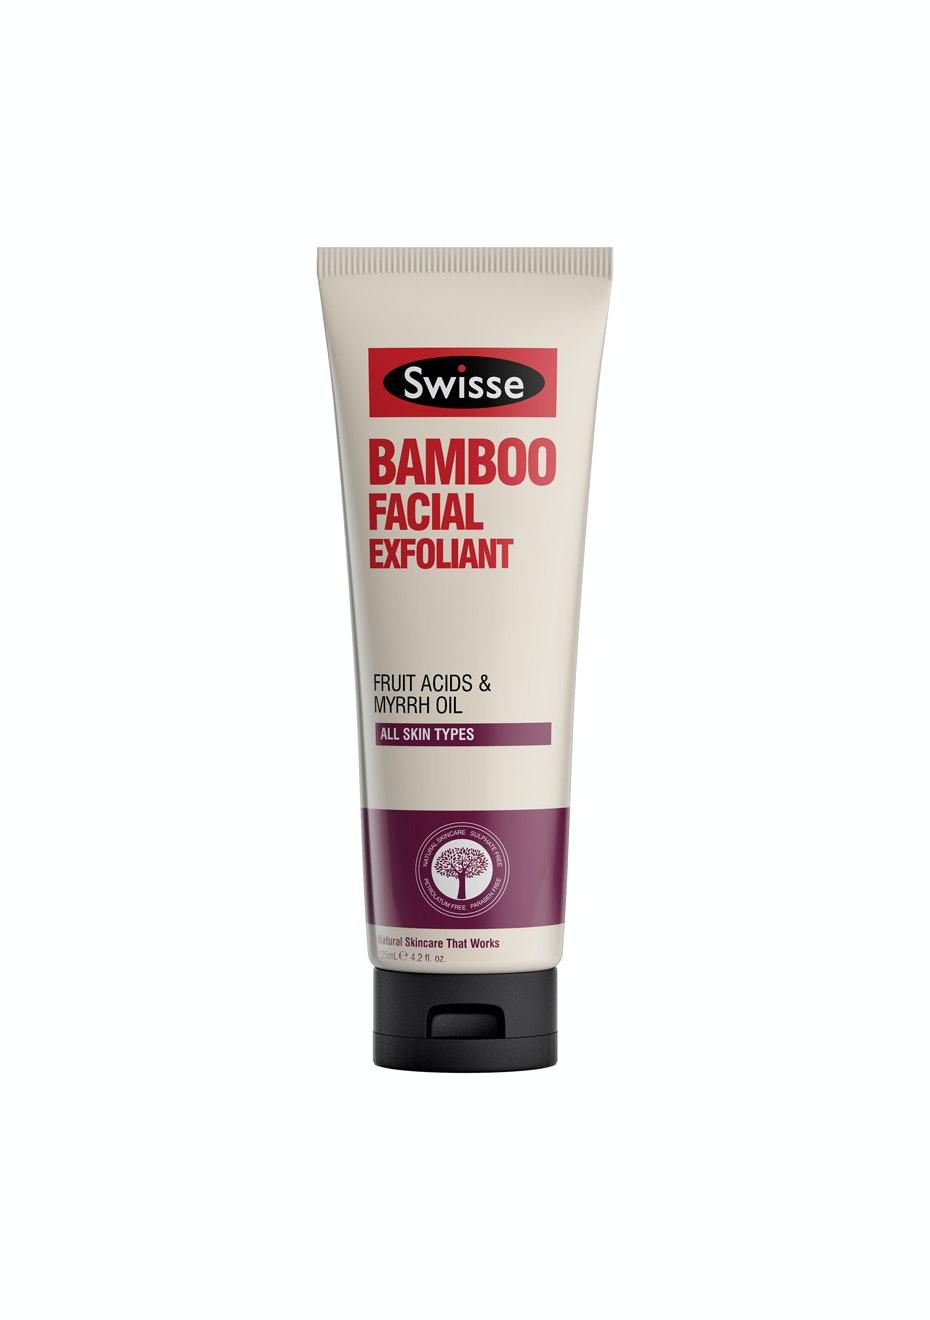 Swisse Bamboo Facial Exfoliant 125Ml (Was Polish)